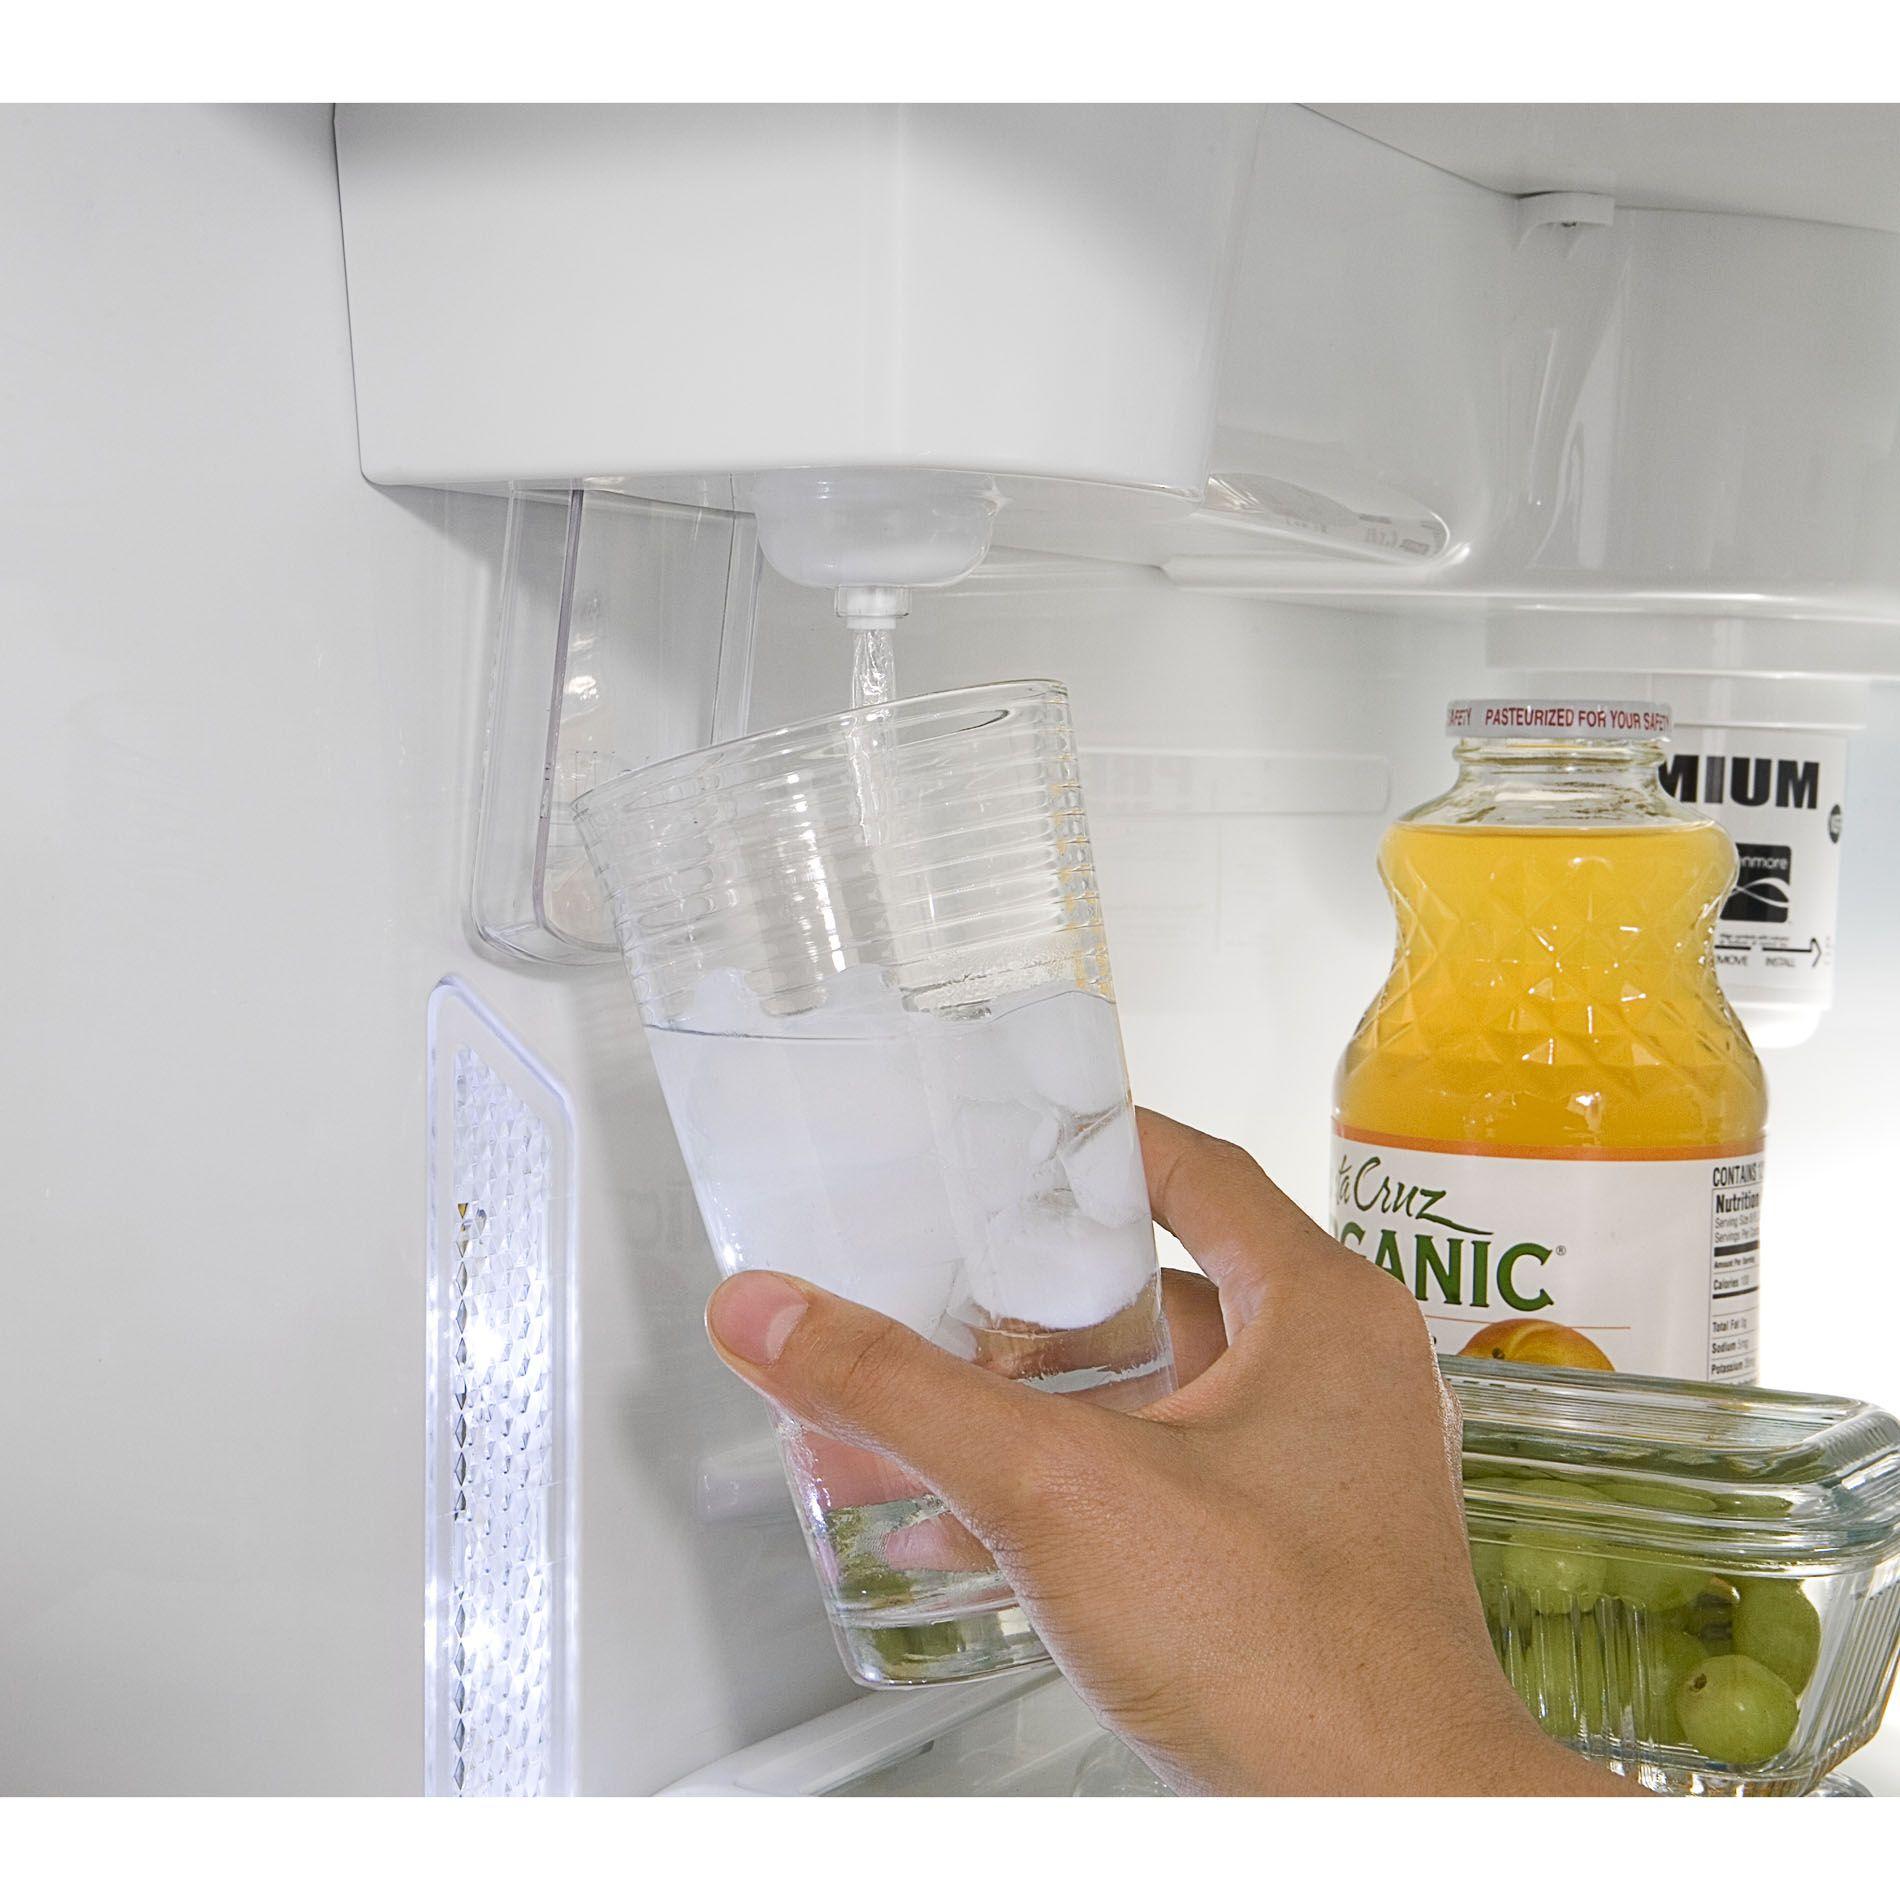 Kenmore 24 cu. ft.  Top-Freezer Refrigerator w/ Internal Water Dispenser - Black